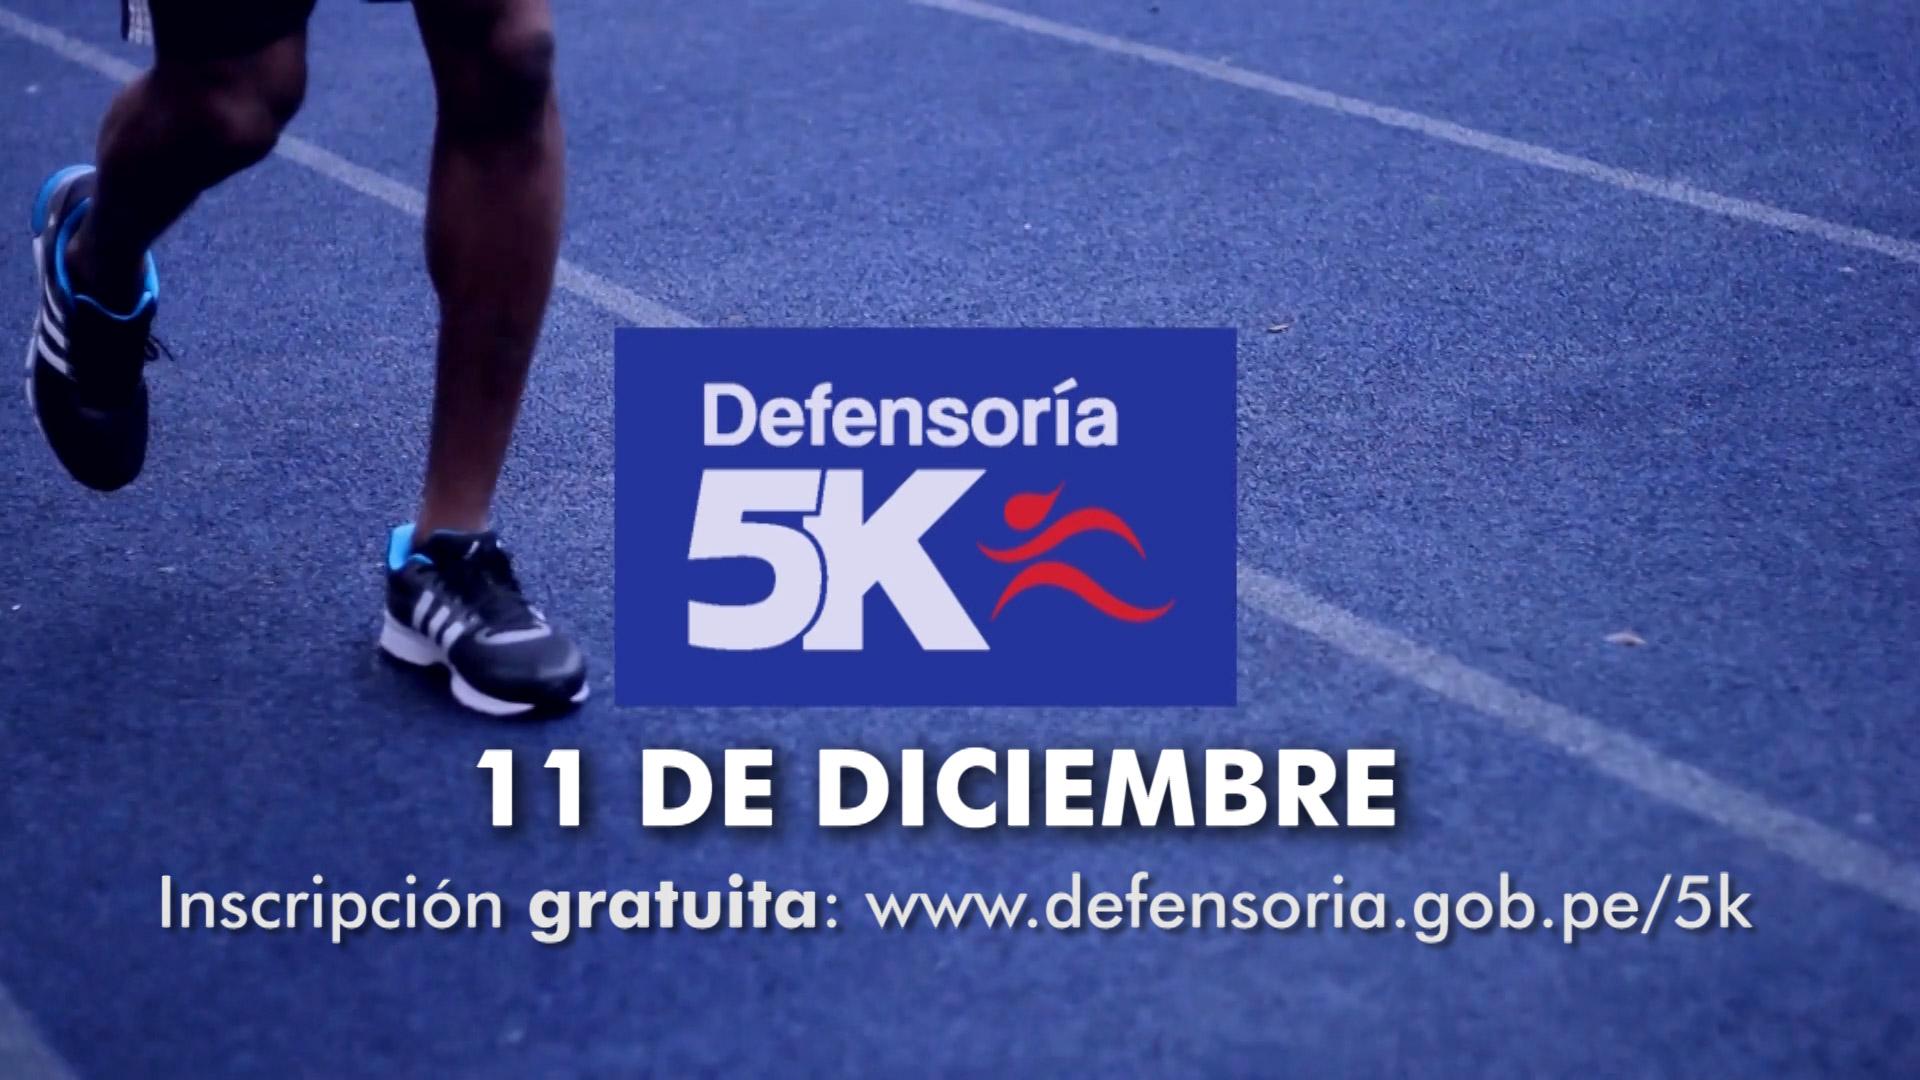 defensoria-5k